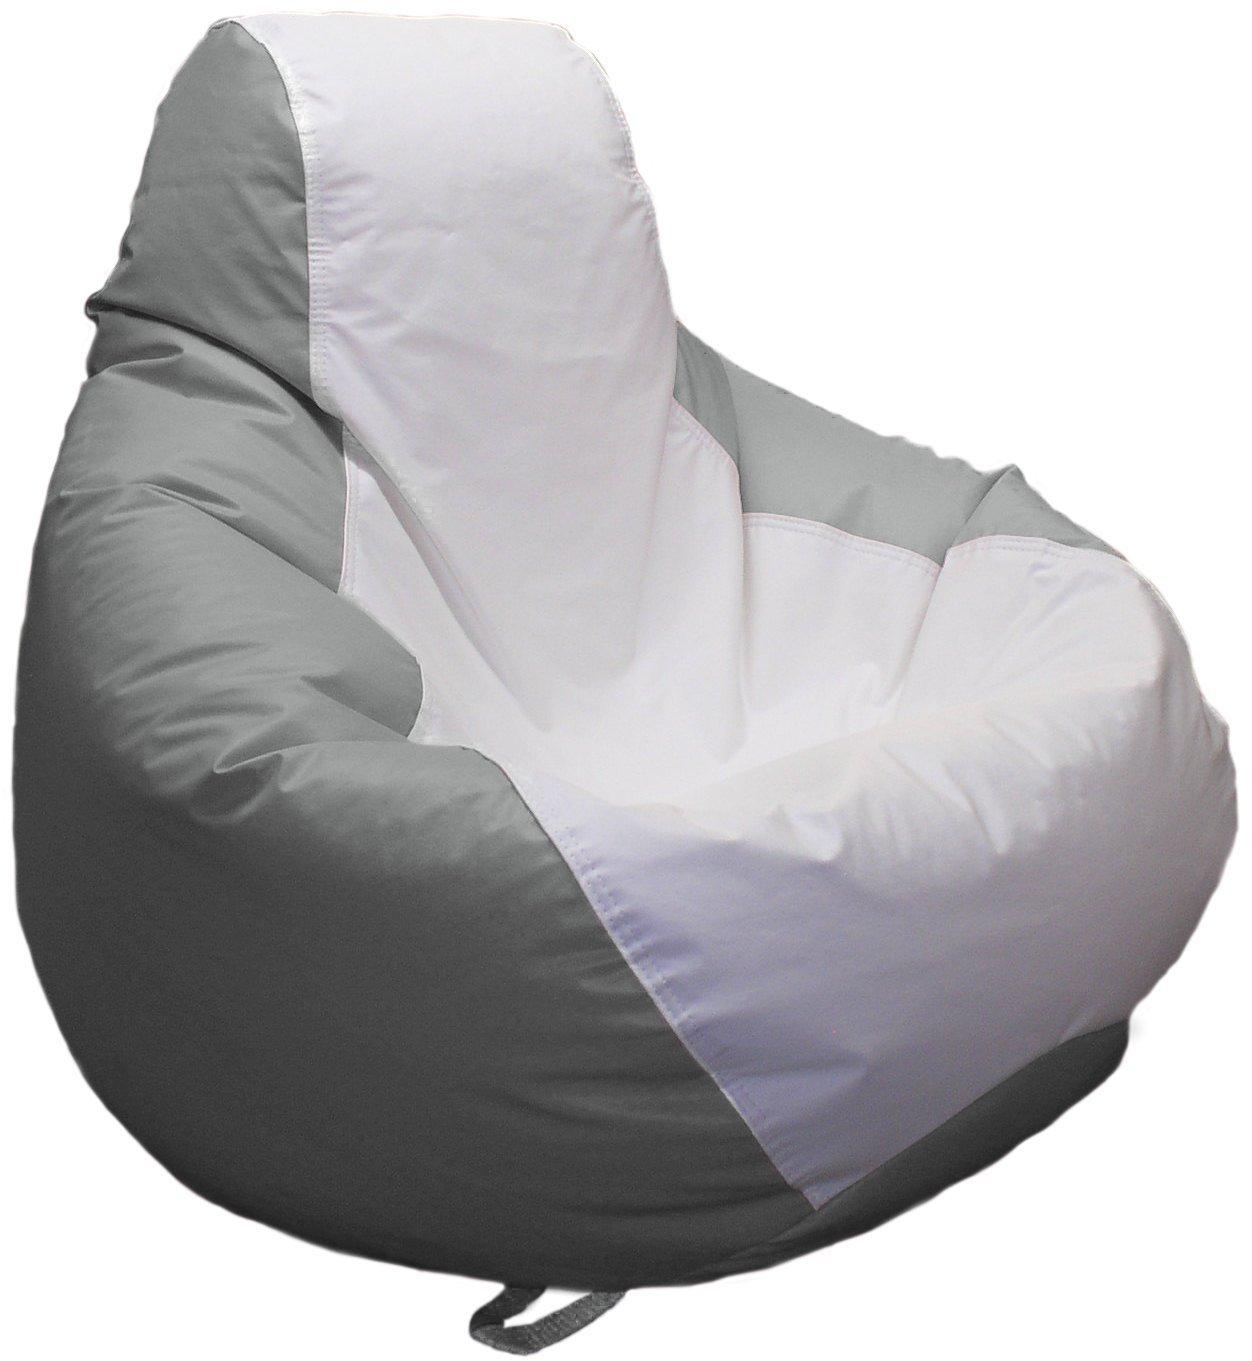 Ocean-Tamer Medium Teardrop Marine Bean Bag (White/Med Gray) by Ocean-Tamer Marine Bean Bags